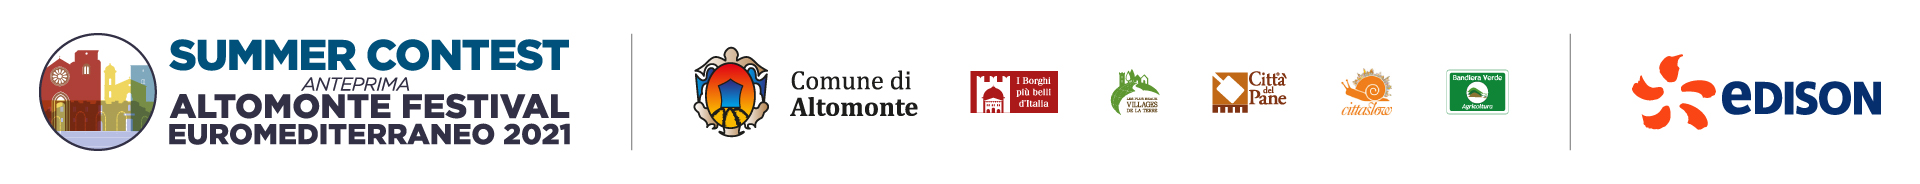 Altomonte Festival Euromediterraneo 2021